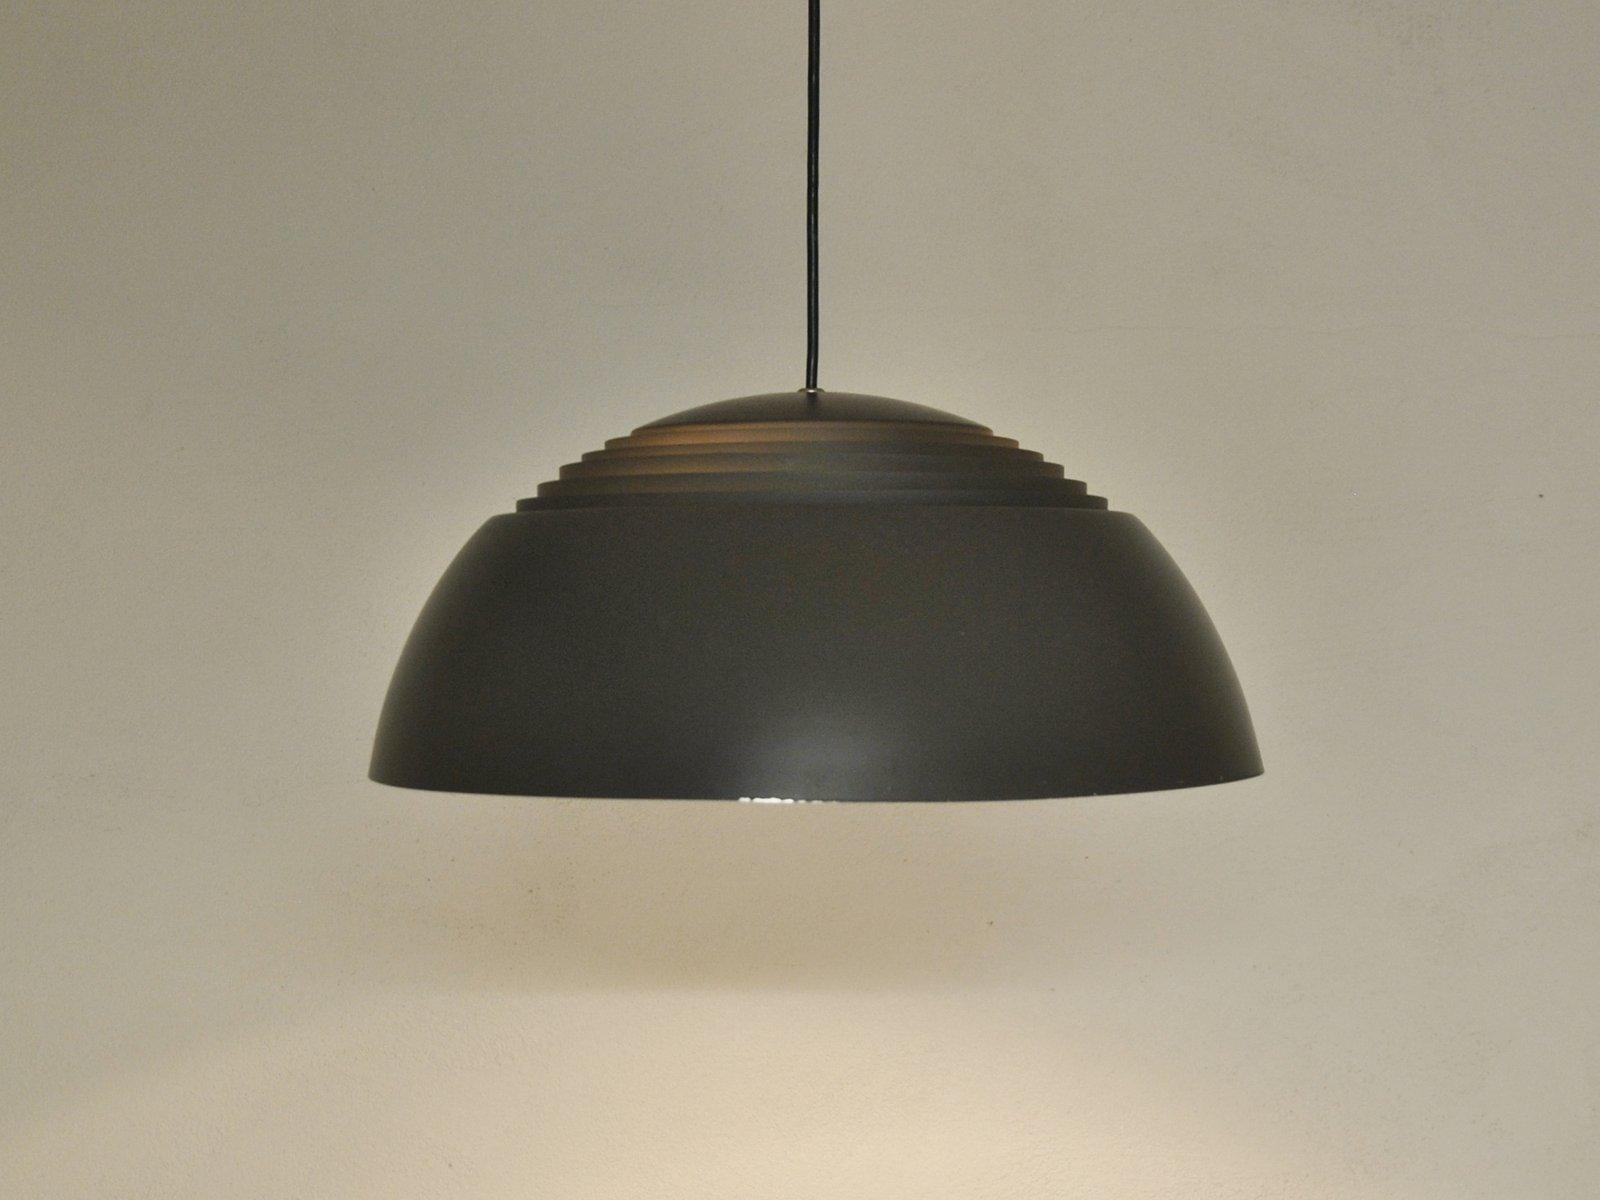 Moderne Lampen 52 : Esstisch lampen ikea lampen avec esstisch lampen ikea et esstisch